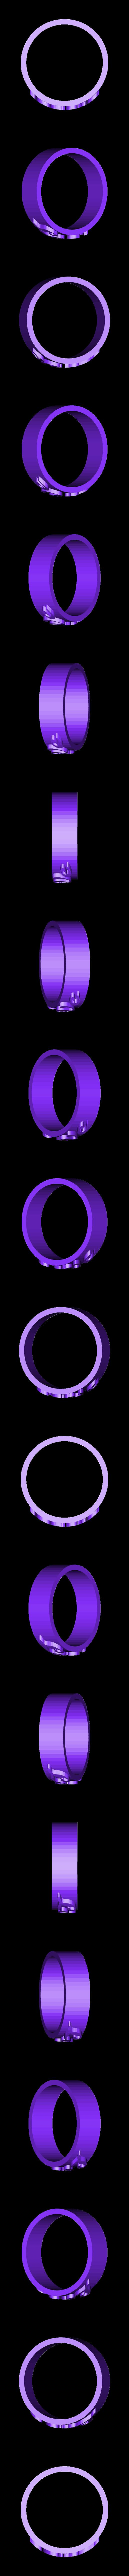 anillo love cerrado 21.stl Télécharger fichier STL gratuit Anillo / Ring Love • Design pour impression 3D, amg3D